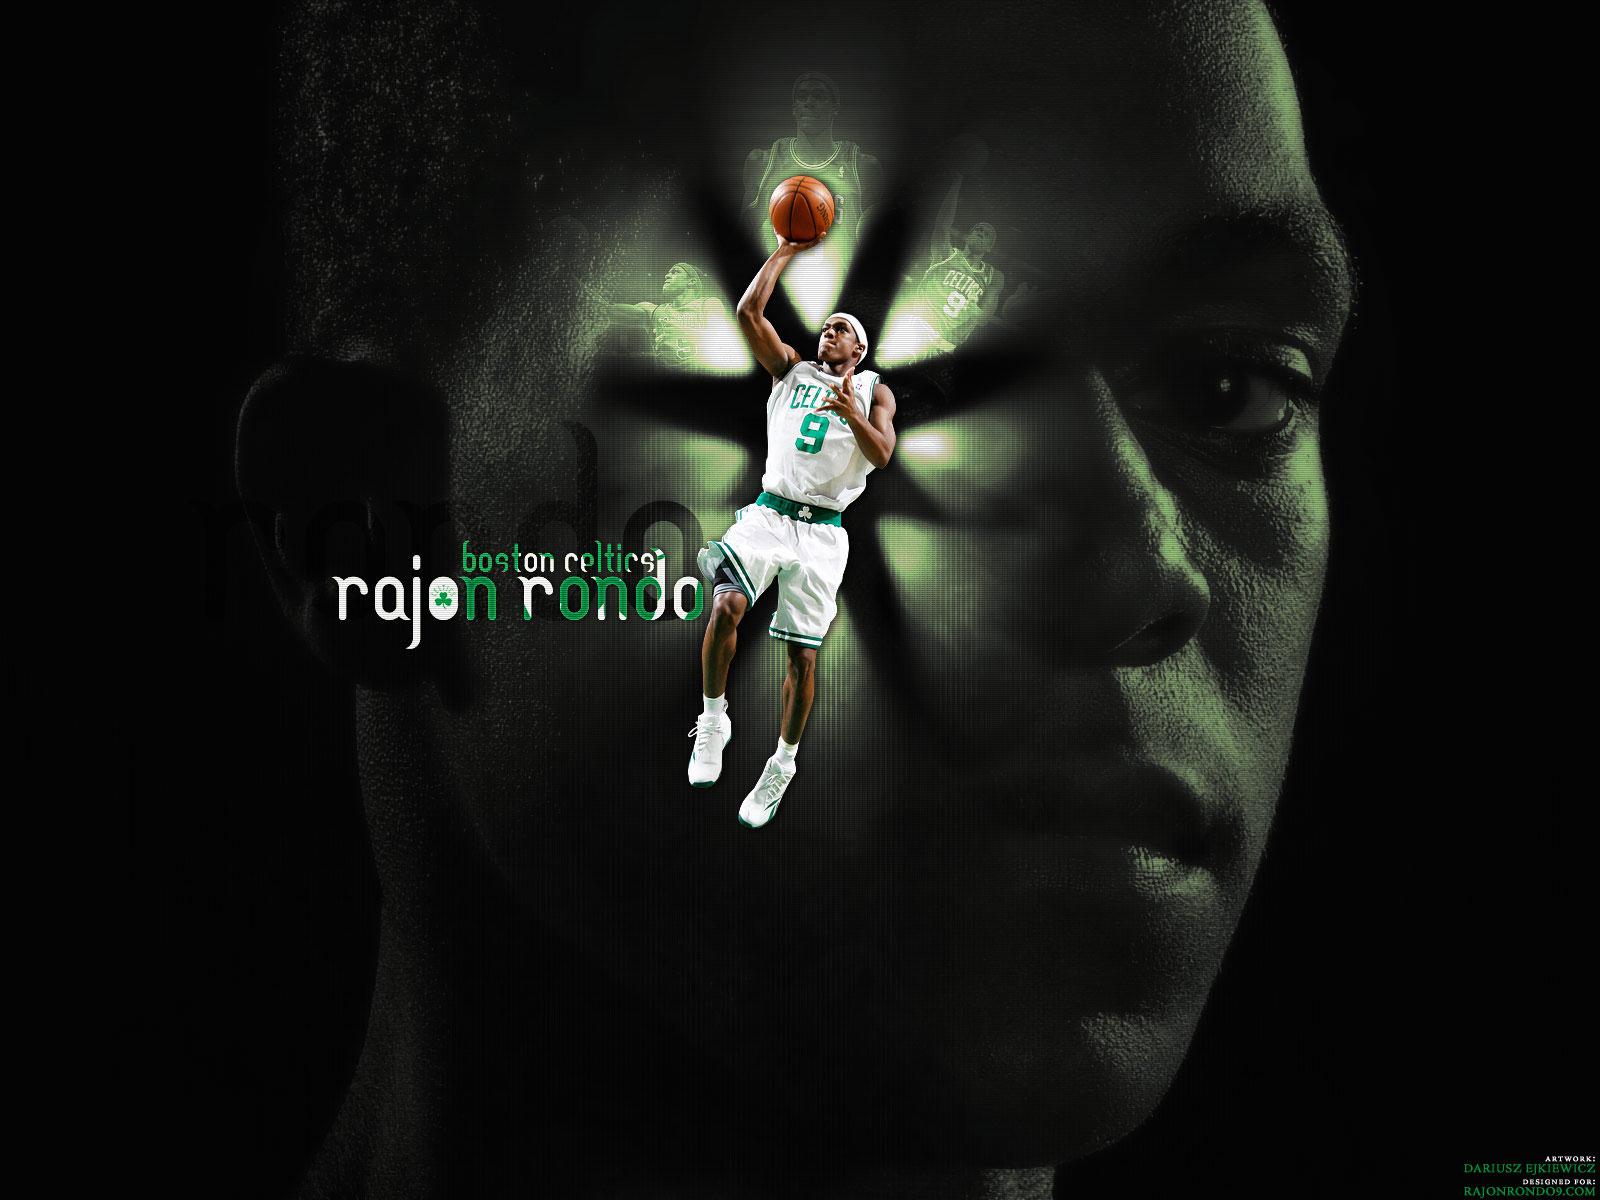 Top NBA Wallpapers: Rajon Rondo Wallpapers